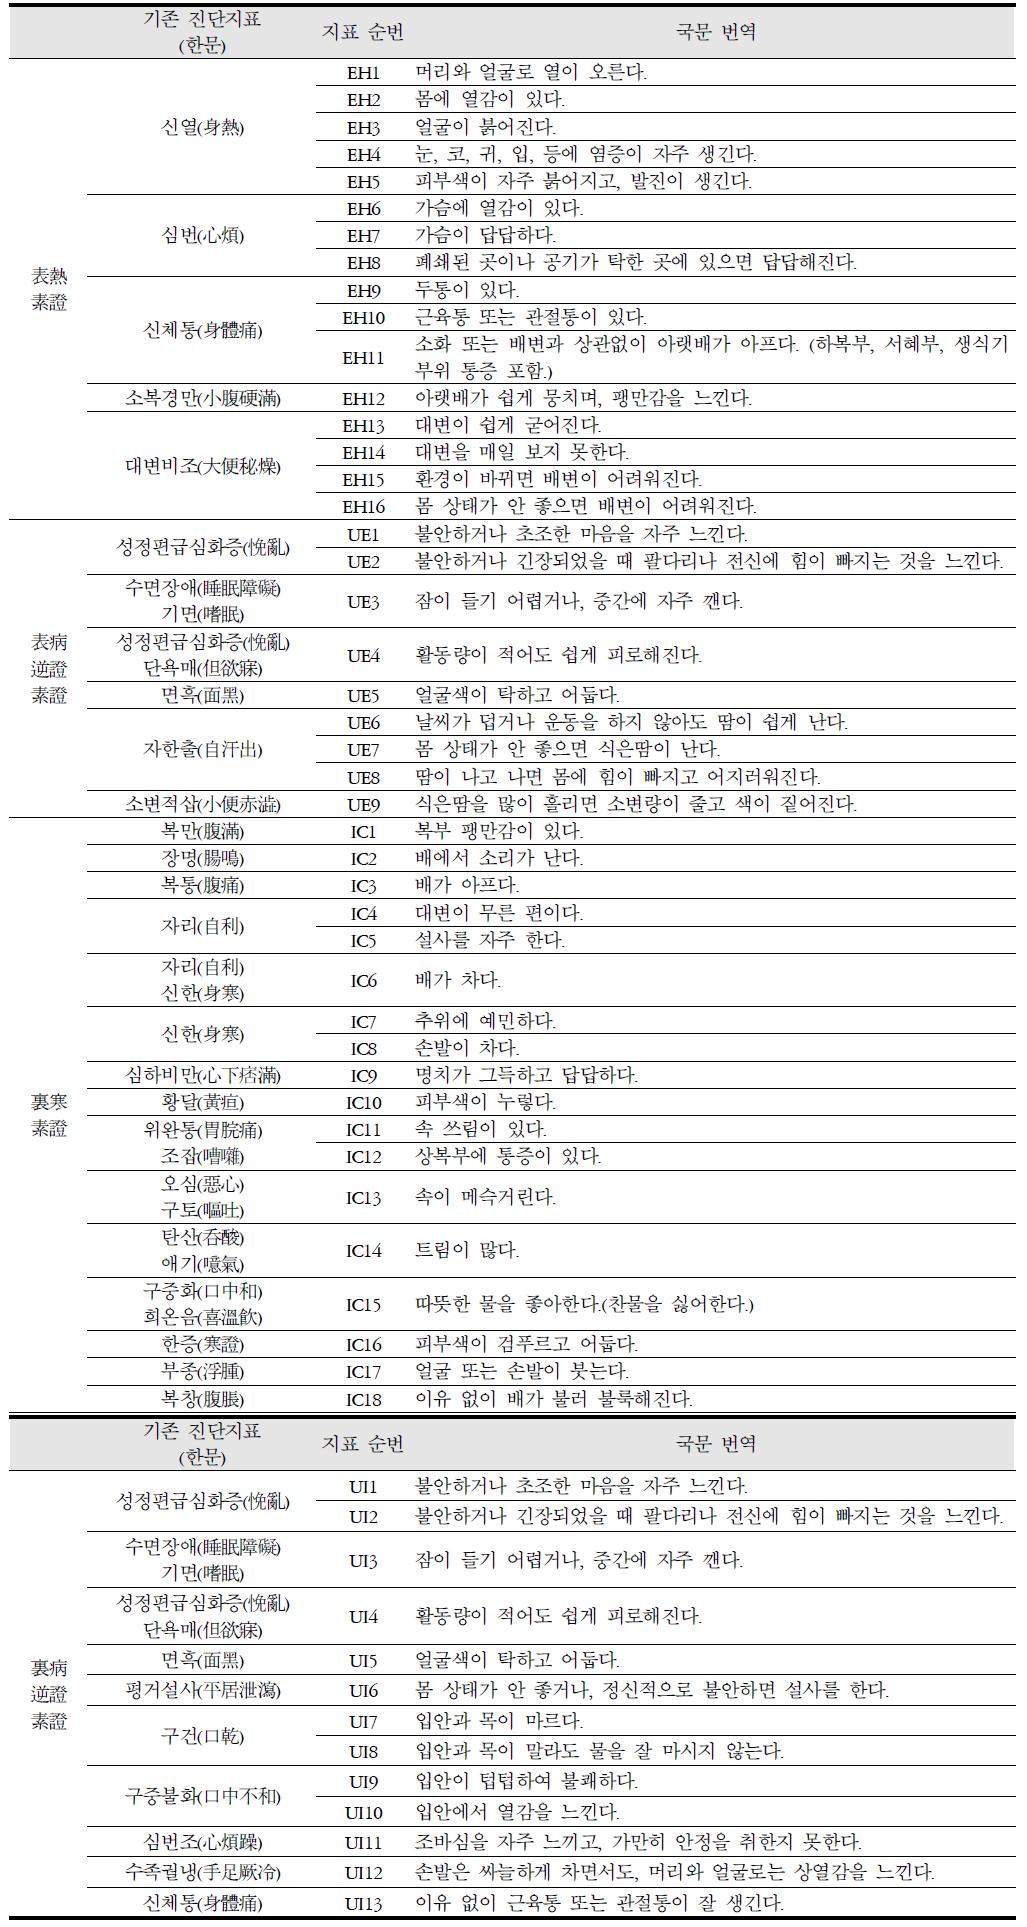 Table 2. Translated Diagnosis Indicators of Soeumin's Ordinary Symptoms